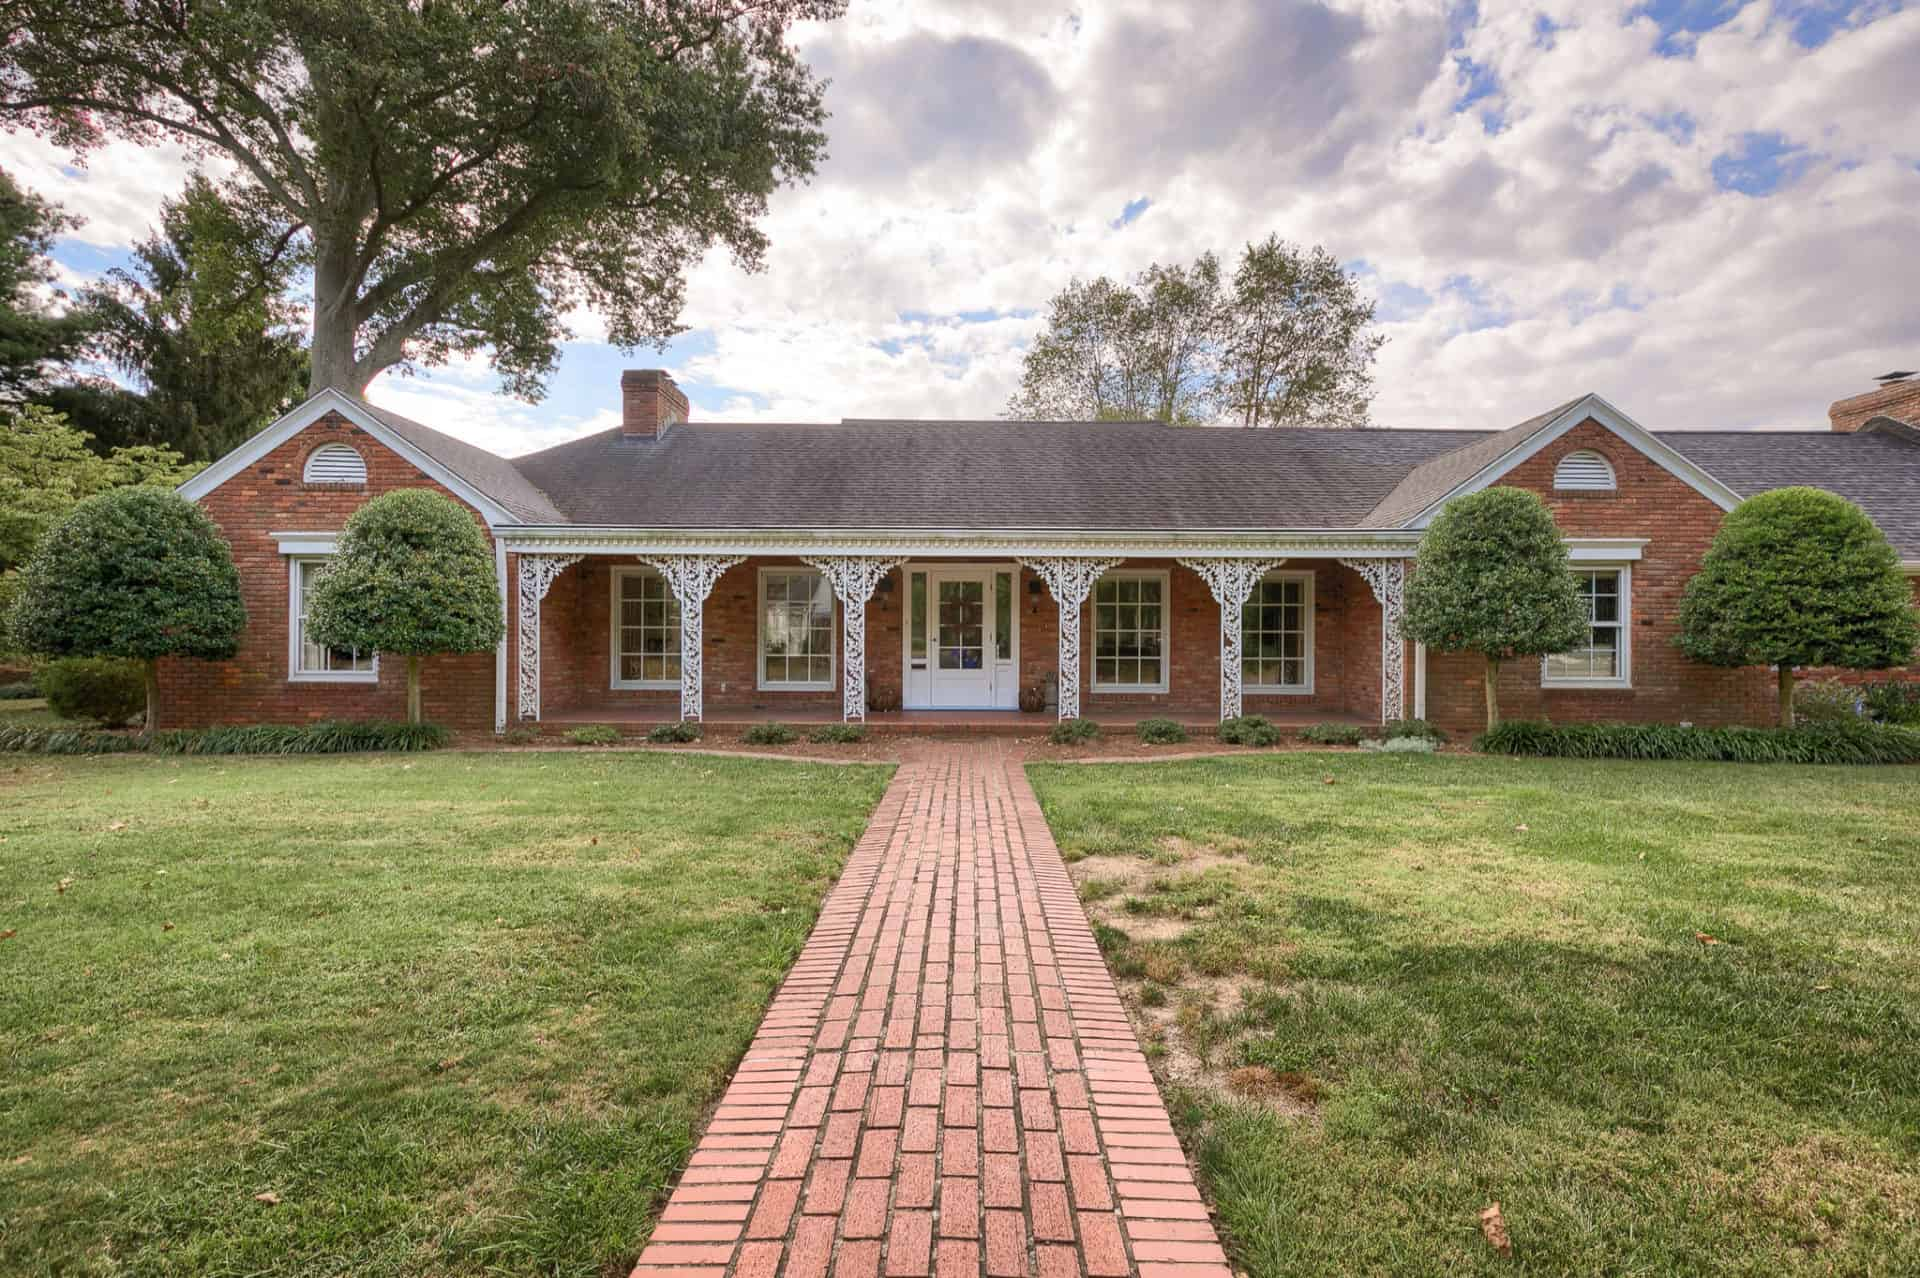 1830 Stratford Dr., Owensboro, KY 42301